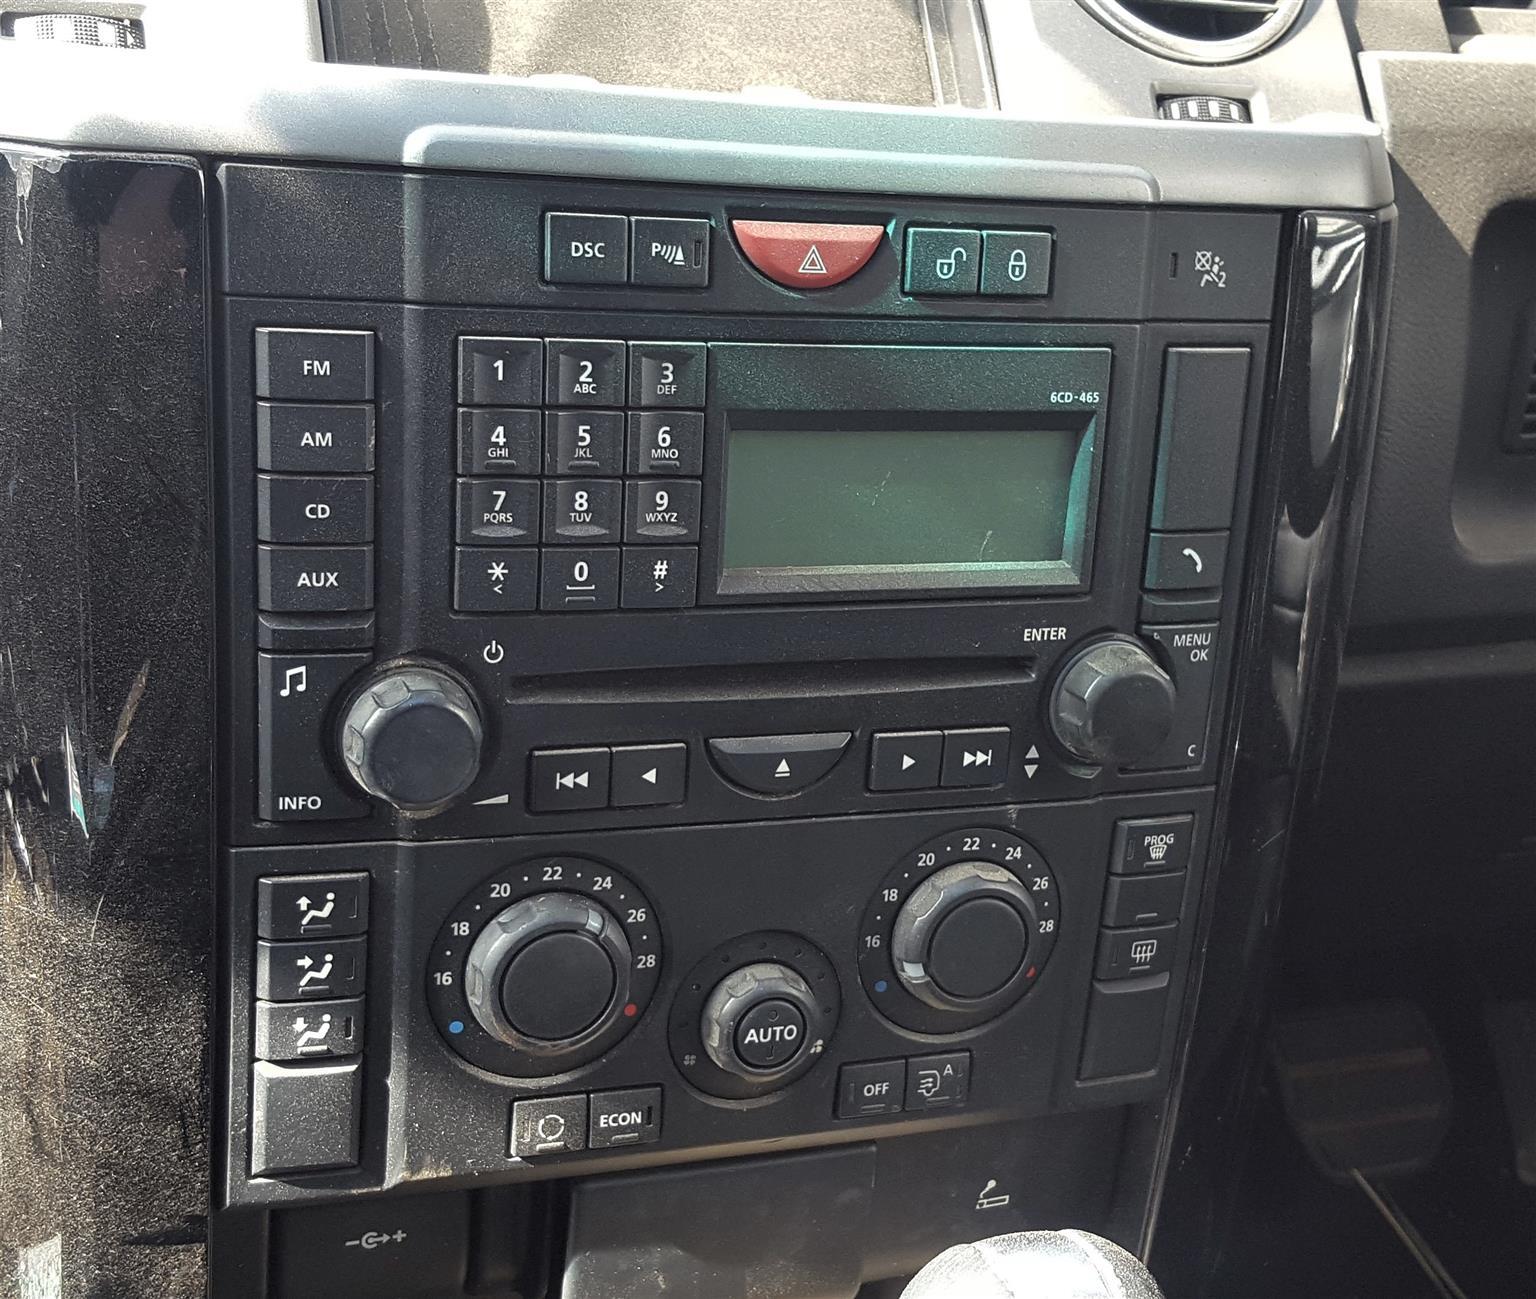 Land Rover Discovery 3 Radio for sale | AUTO EZI